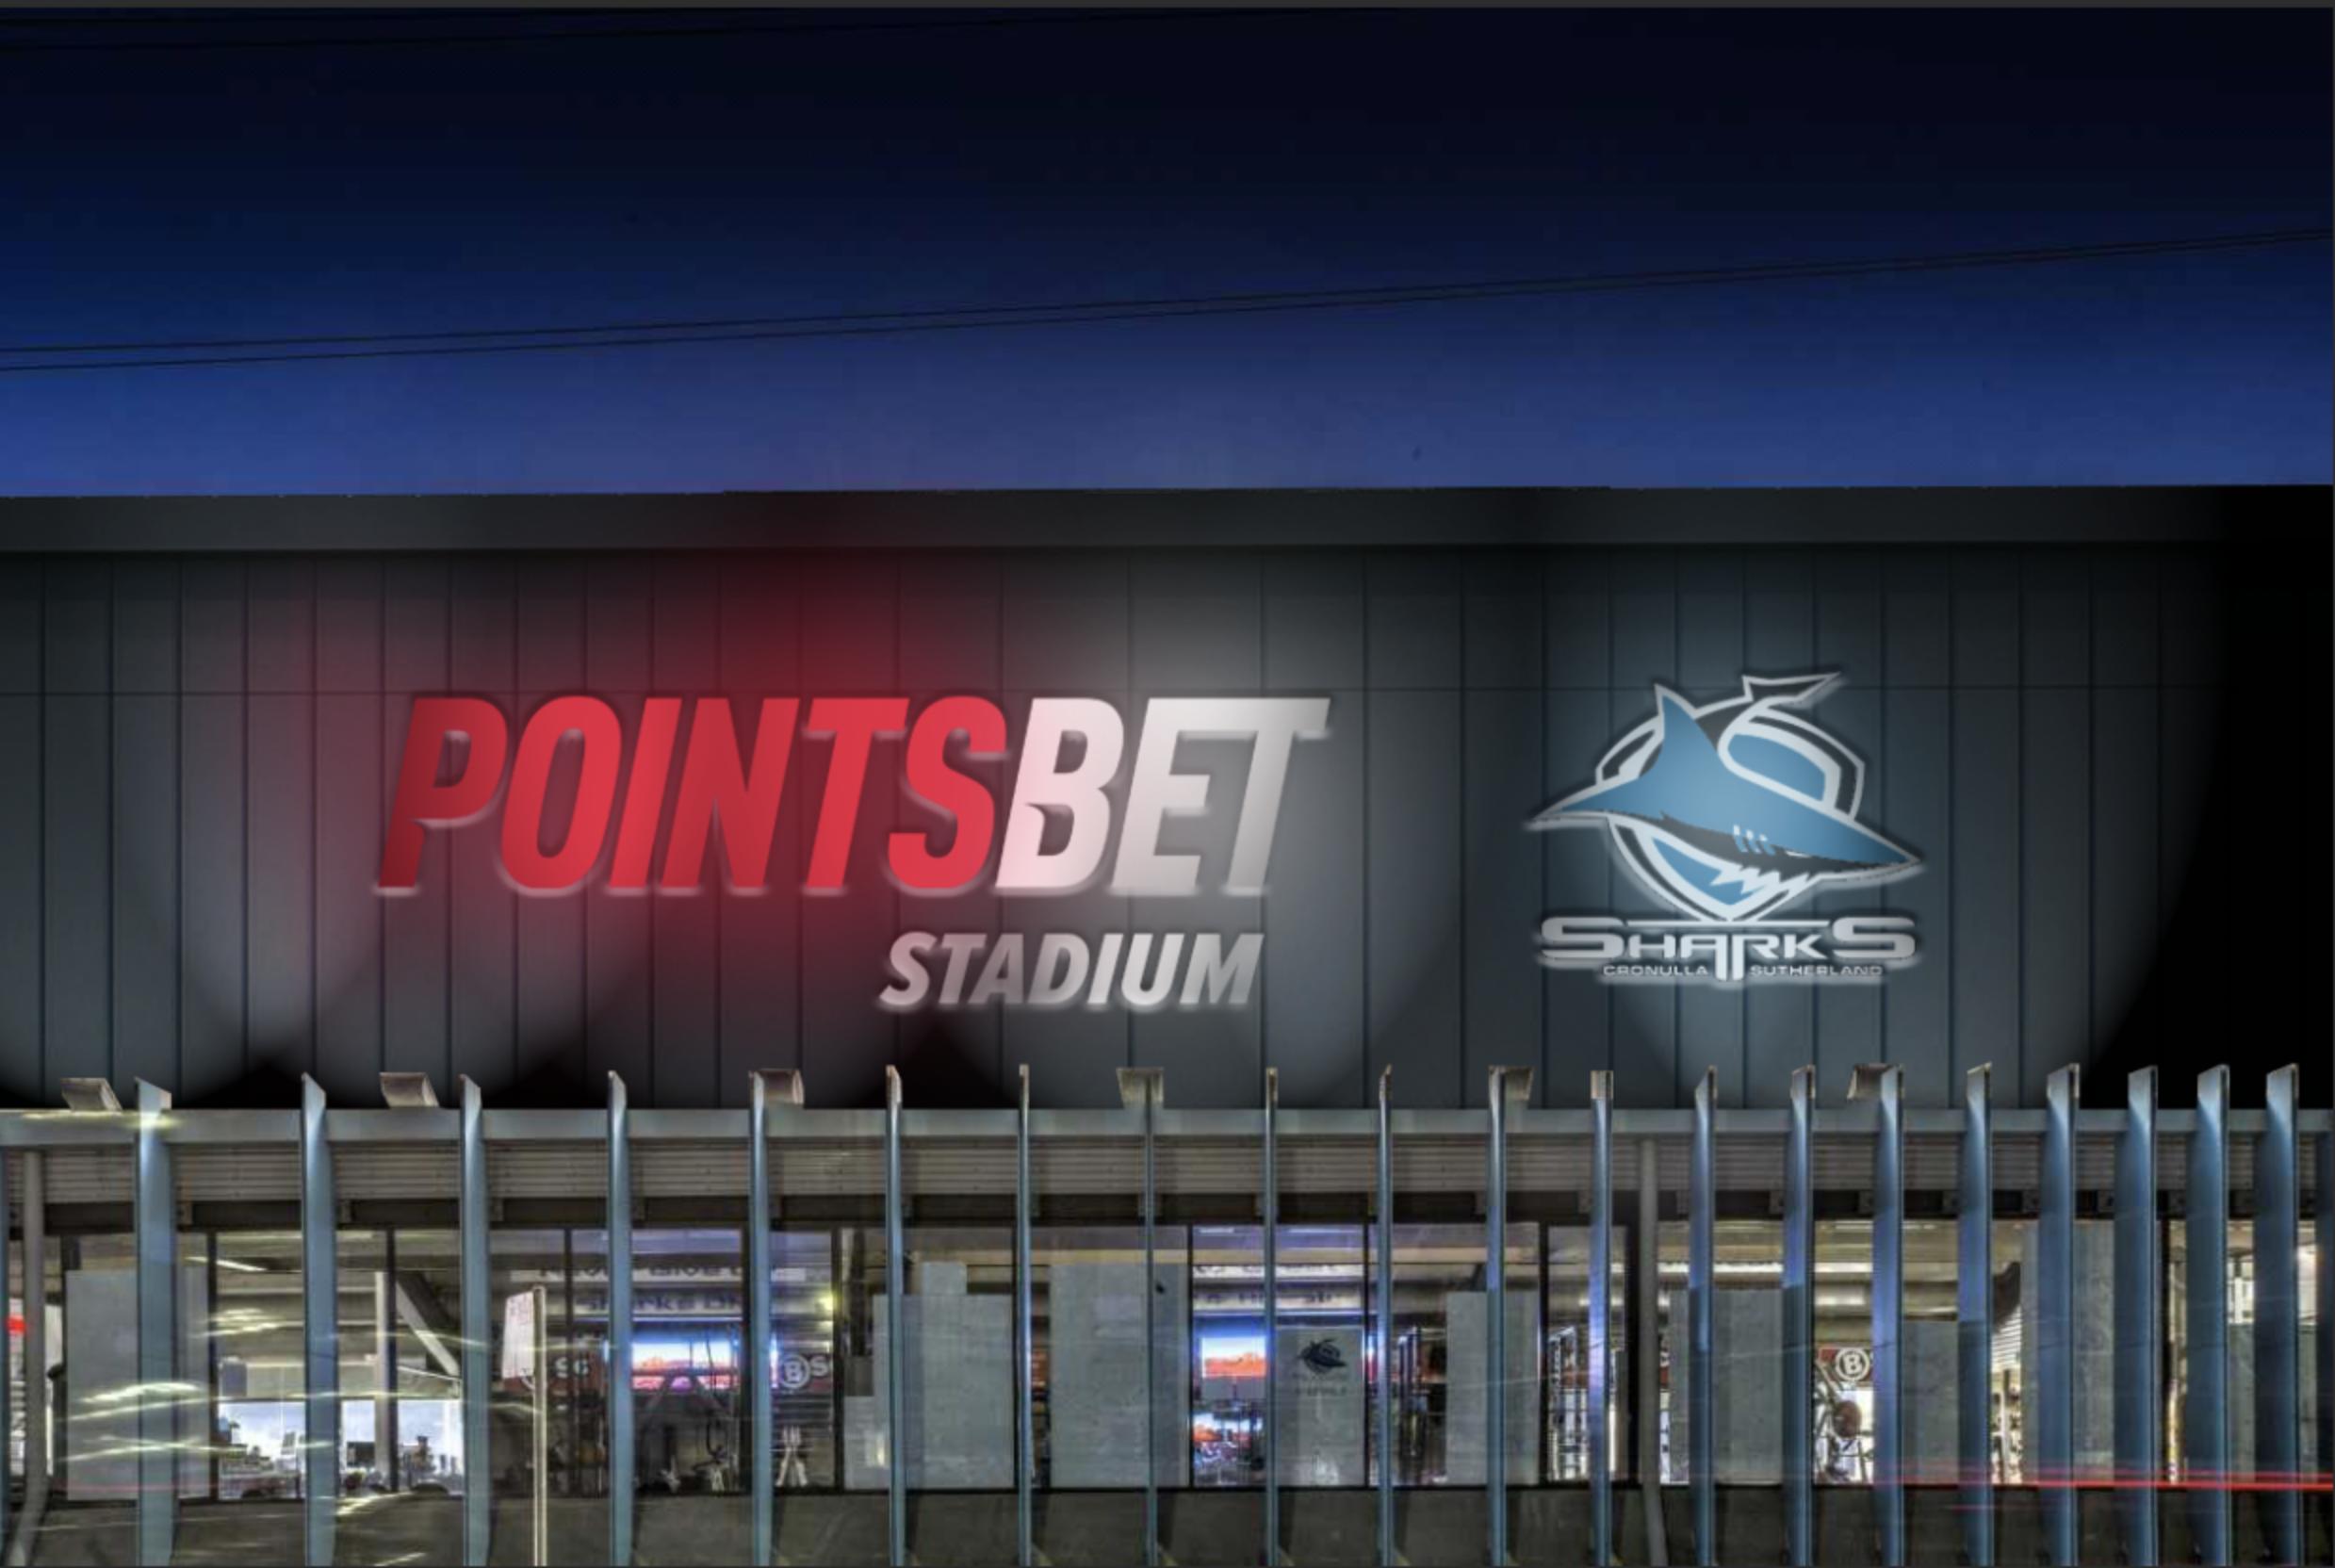 Pin by ebon storti on PB Retail Neon signs, Stadium, Neon